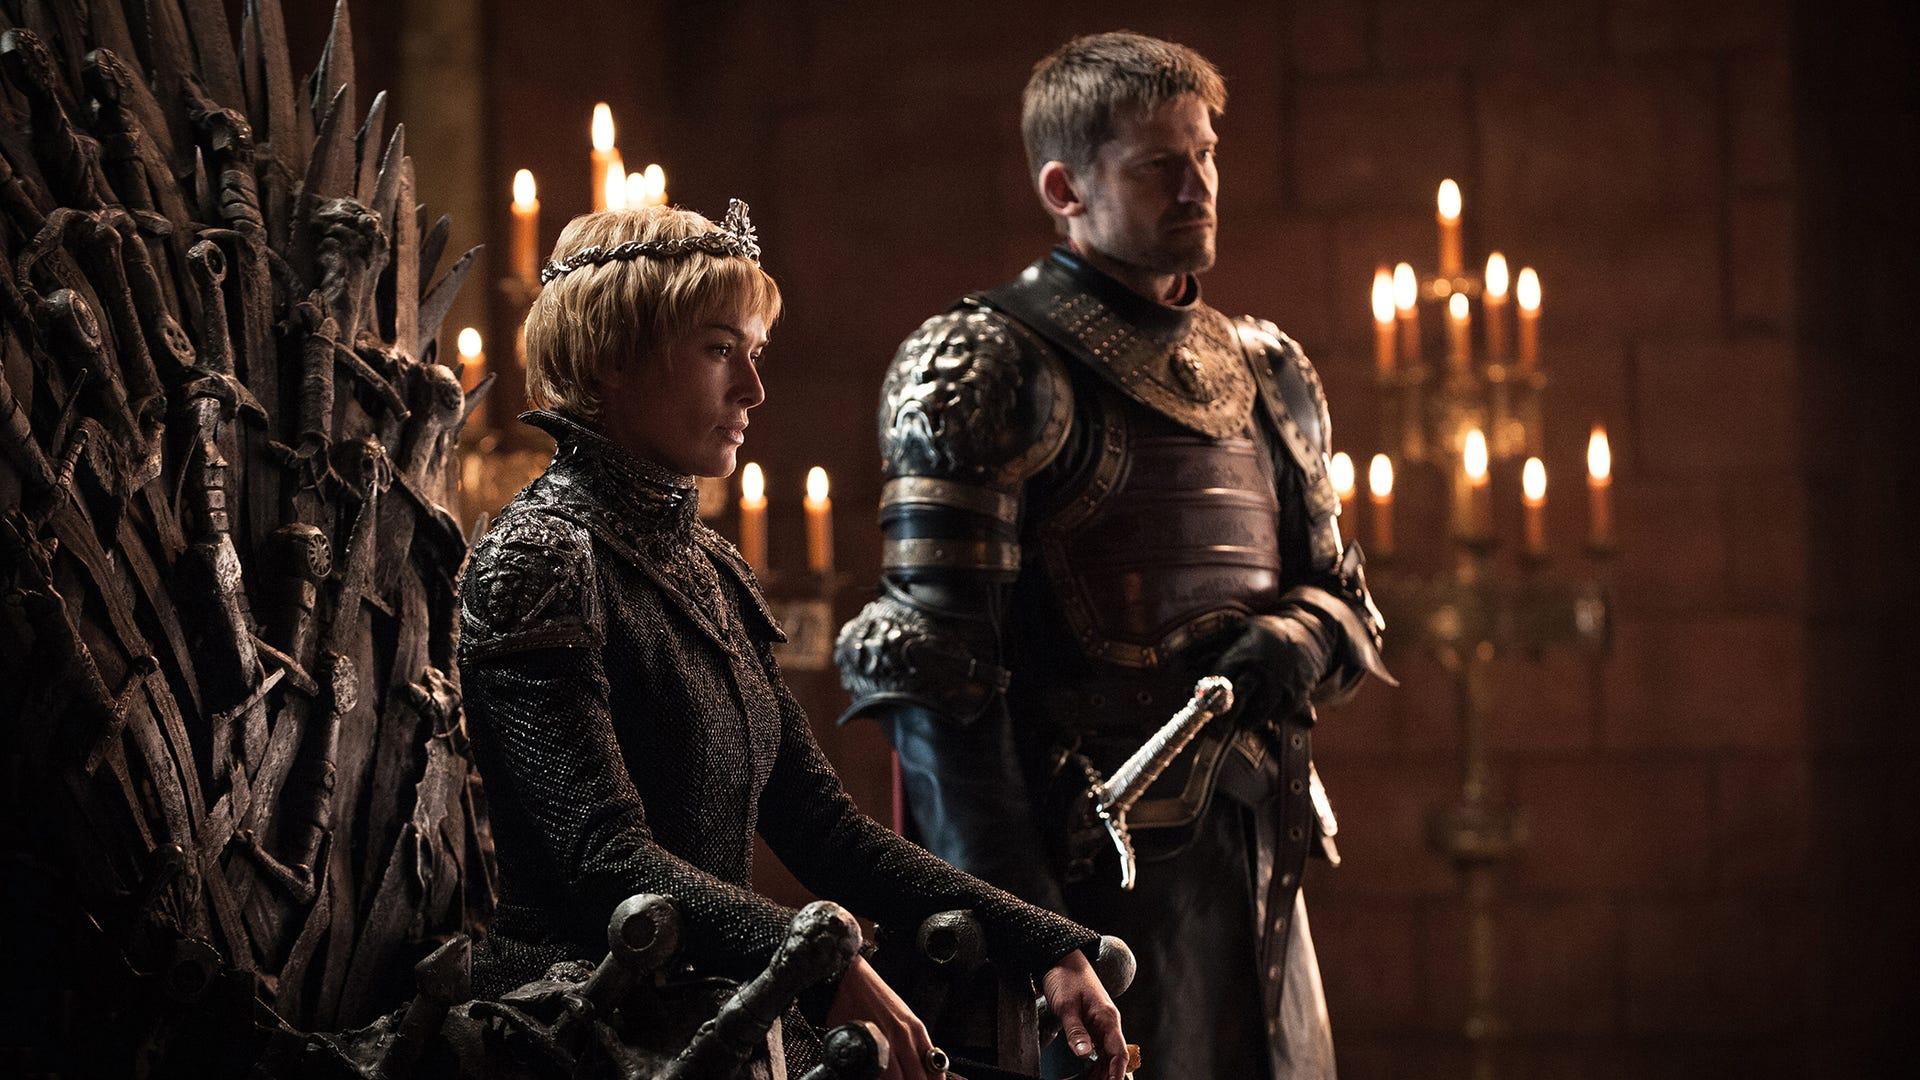 Lena Headey, Nikolaj Coster-Waldau; Game of Thrones